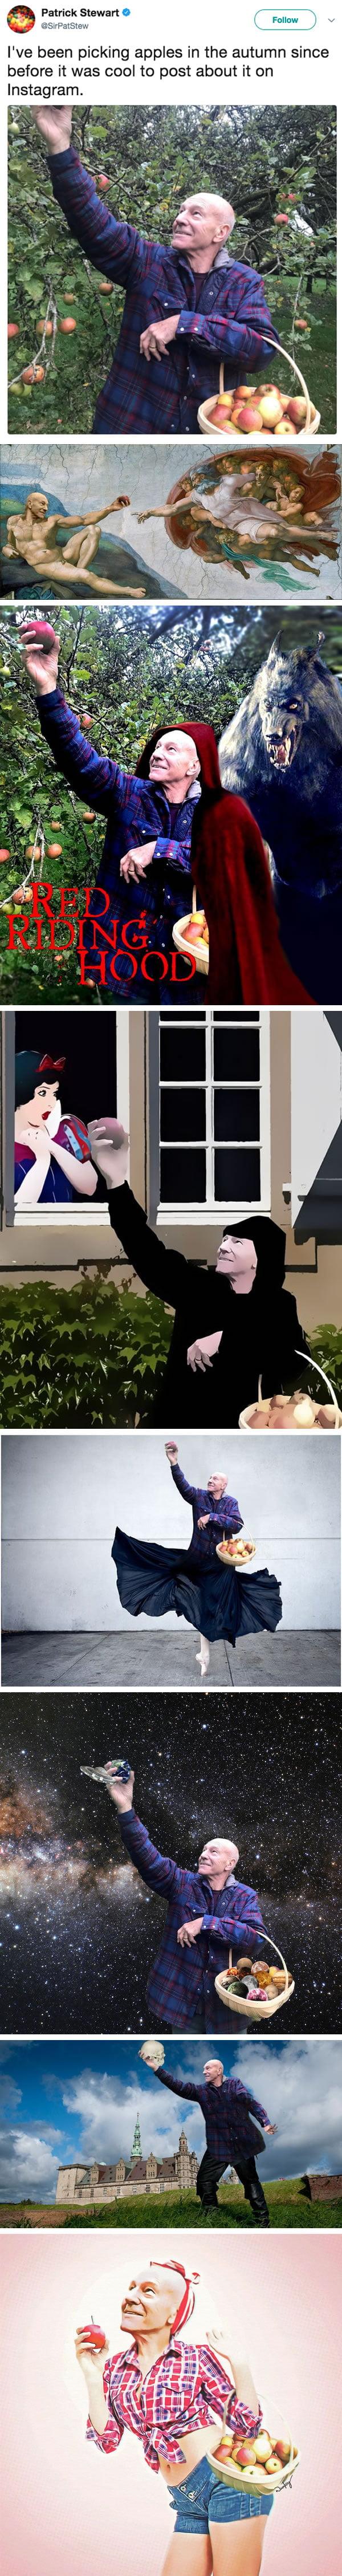 Patrick Stewart's Joyous Apple-Picking Trip Sparks Glorious Photoshop Battle